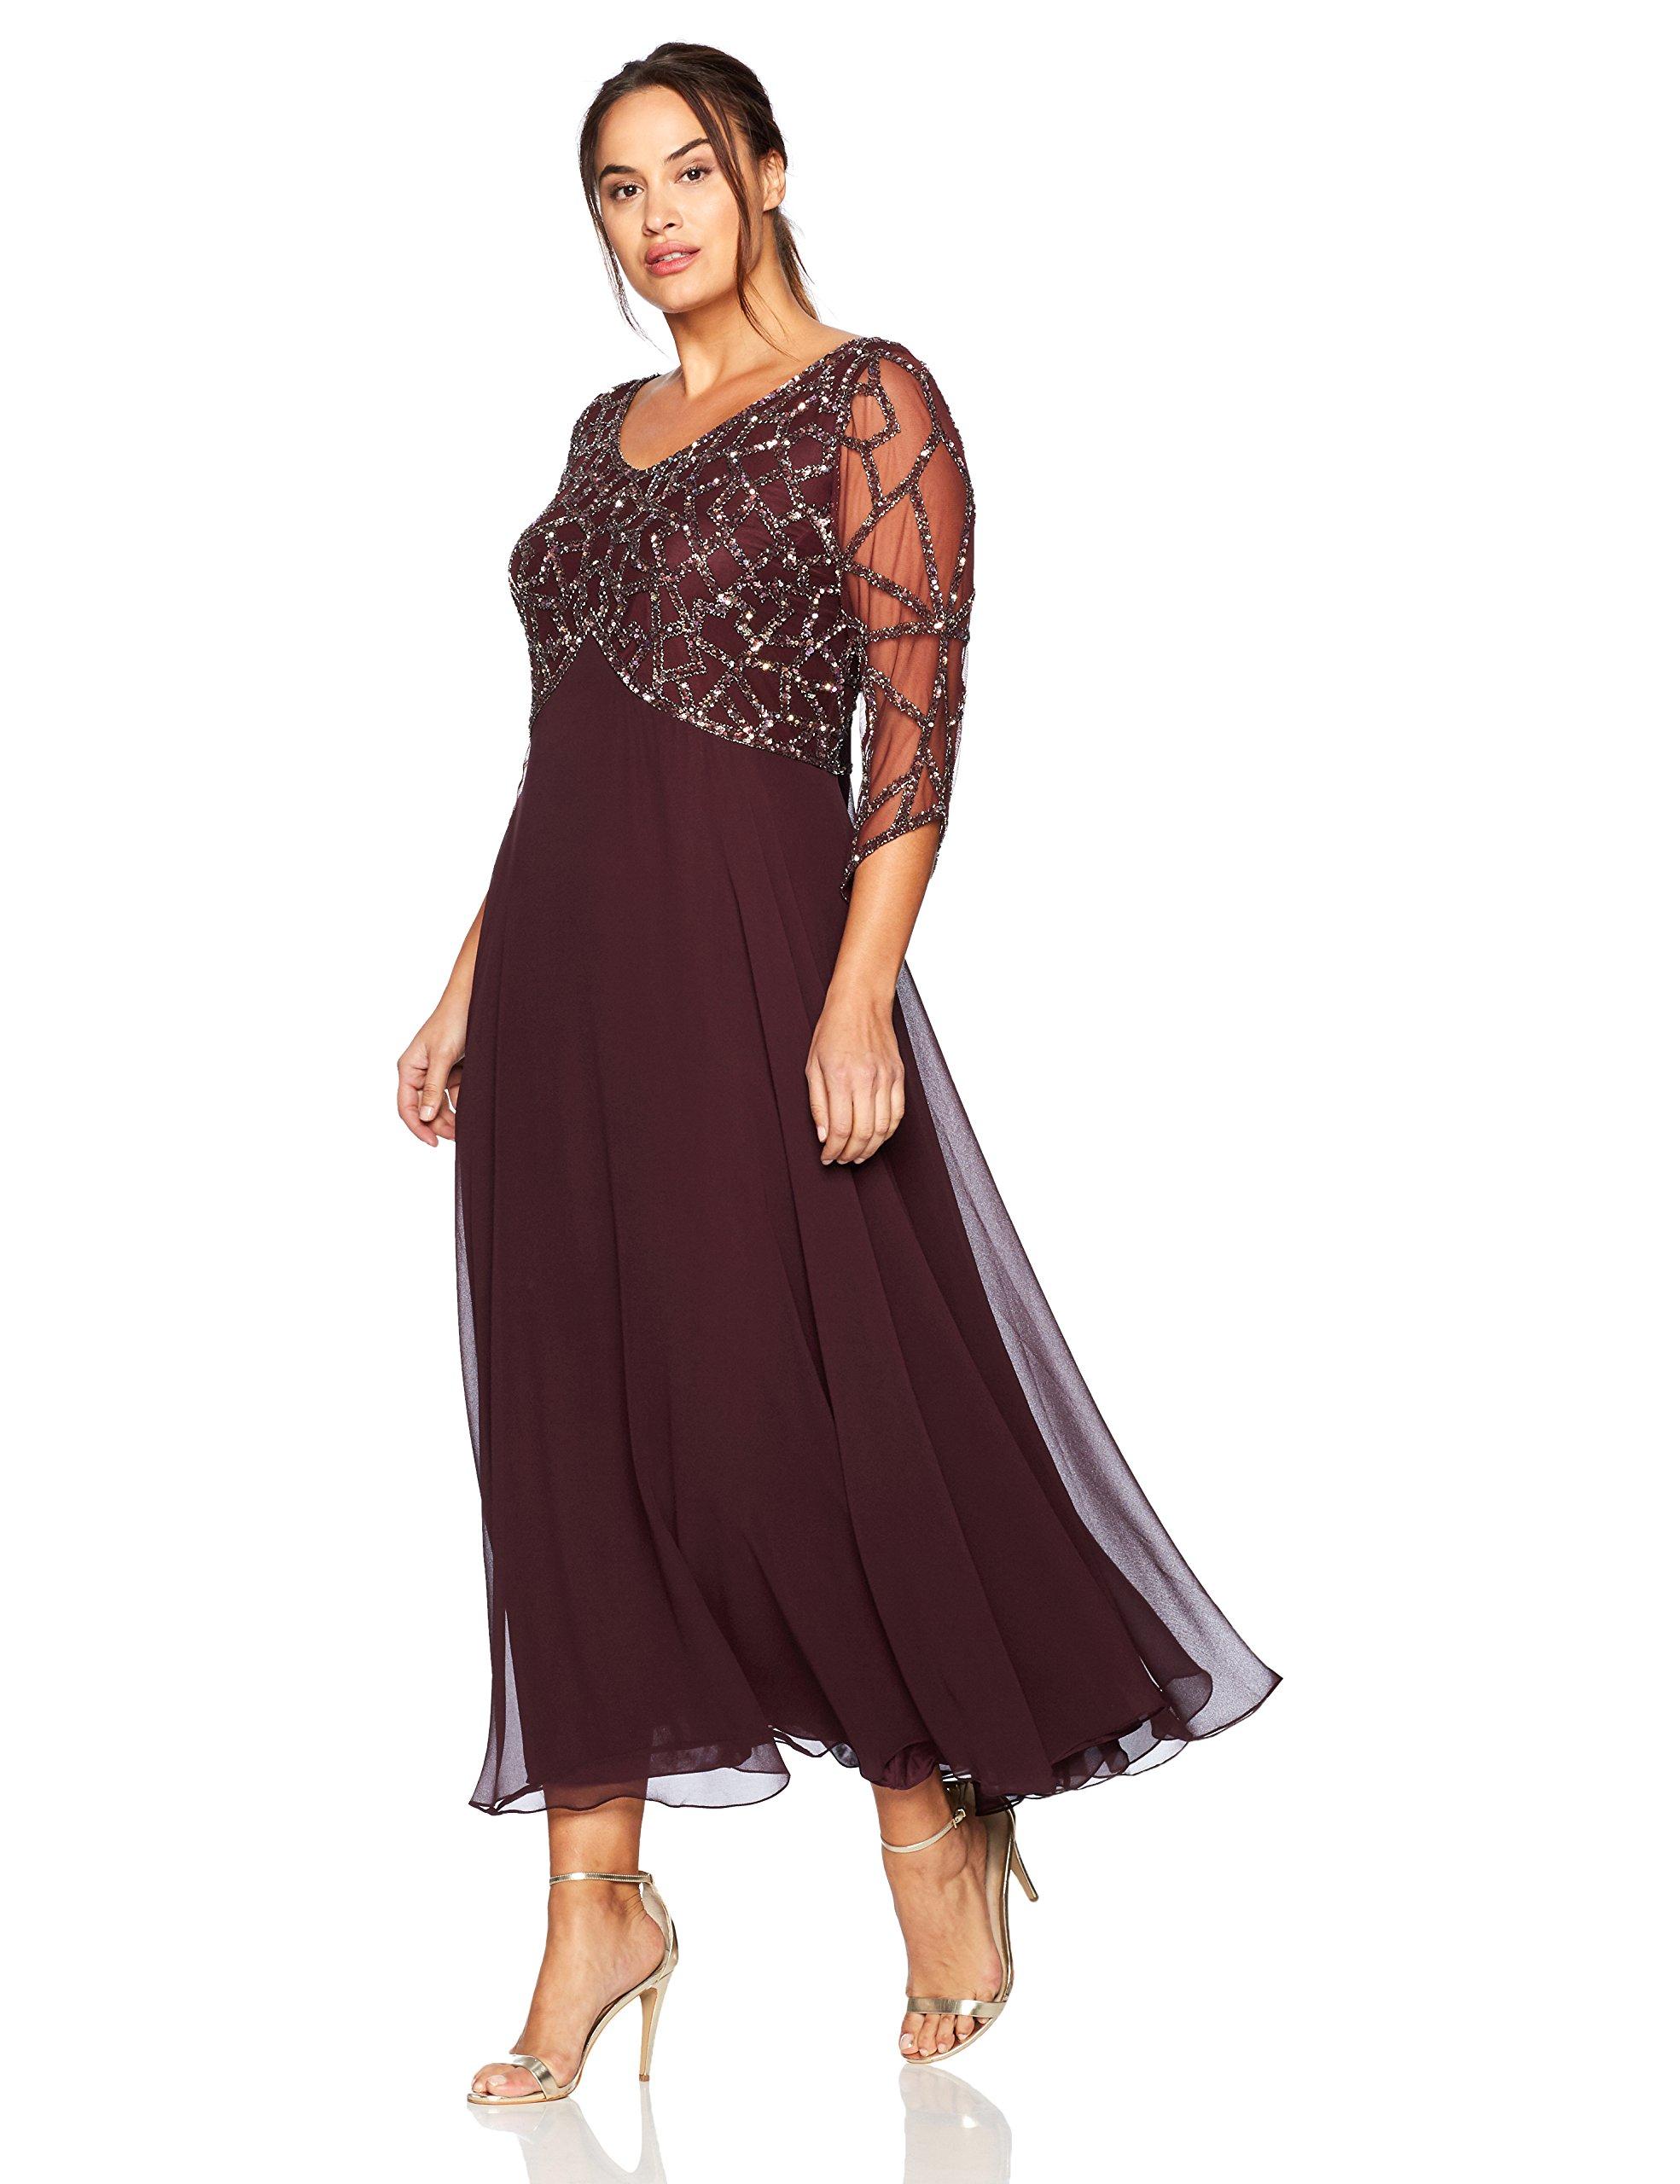 J Kara Women's Plus Size 3/4 Sleeve Geo Beaded Gown, Wine/Mercury, 14W